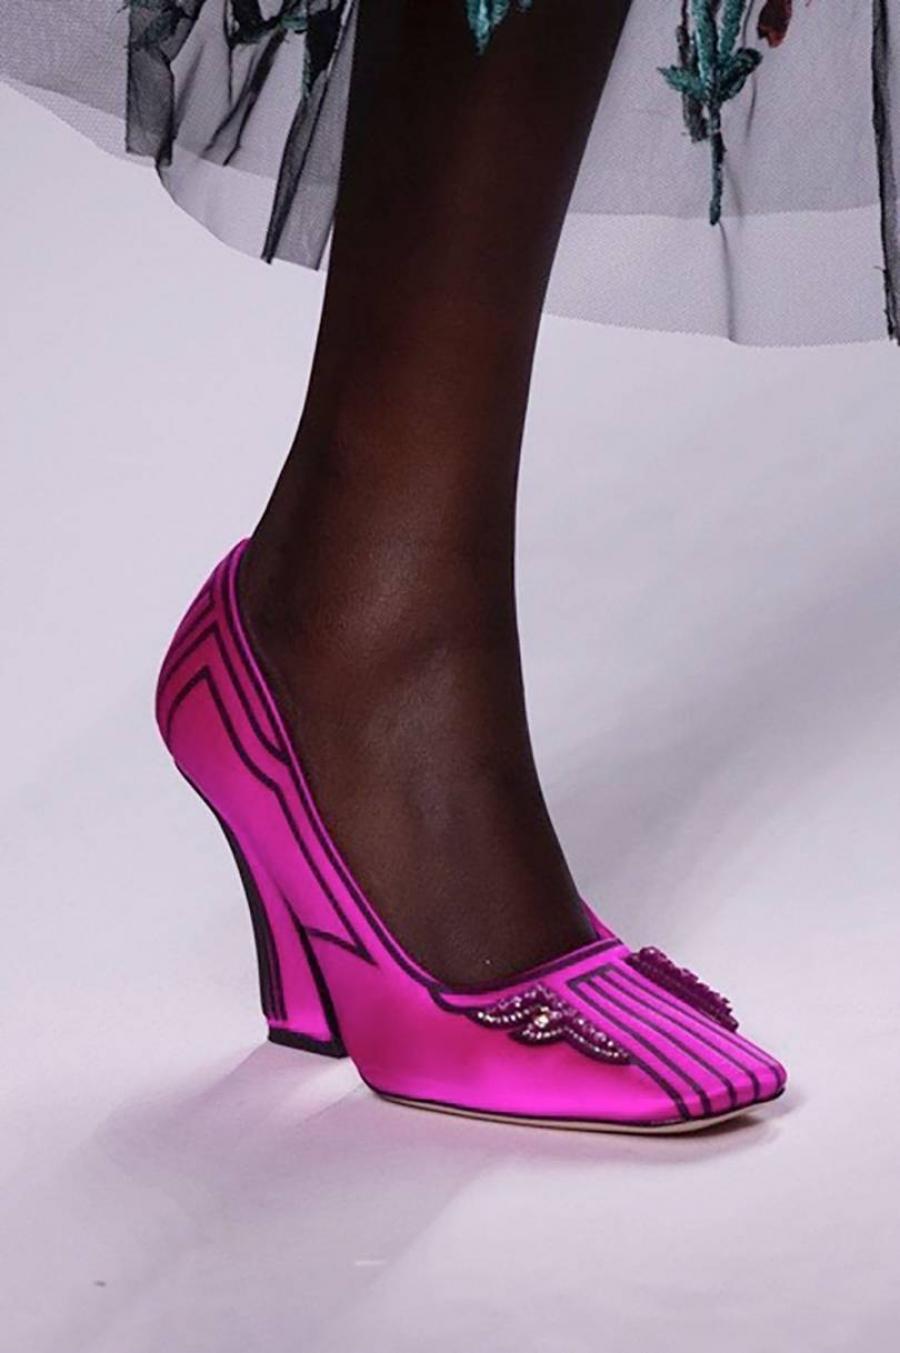 41d5f1688e4 Τα τετράγωνα παπούτσια είναι μεγάλη τάση - CityWoman